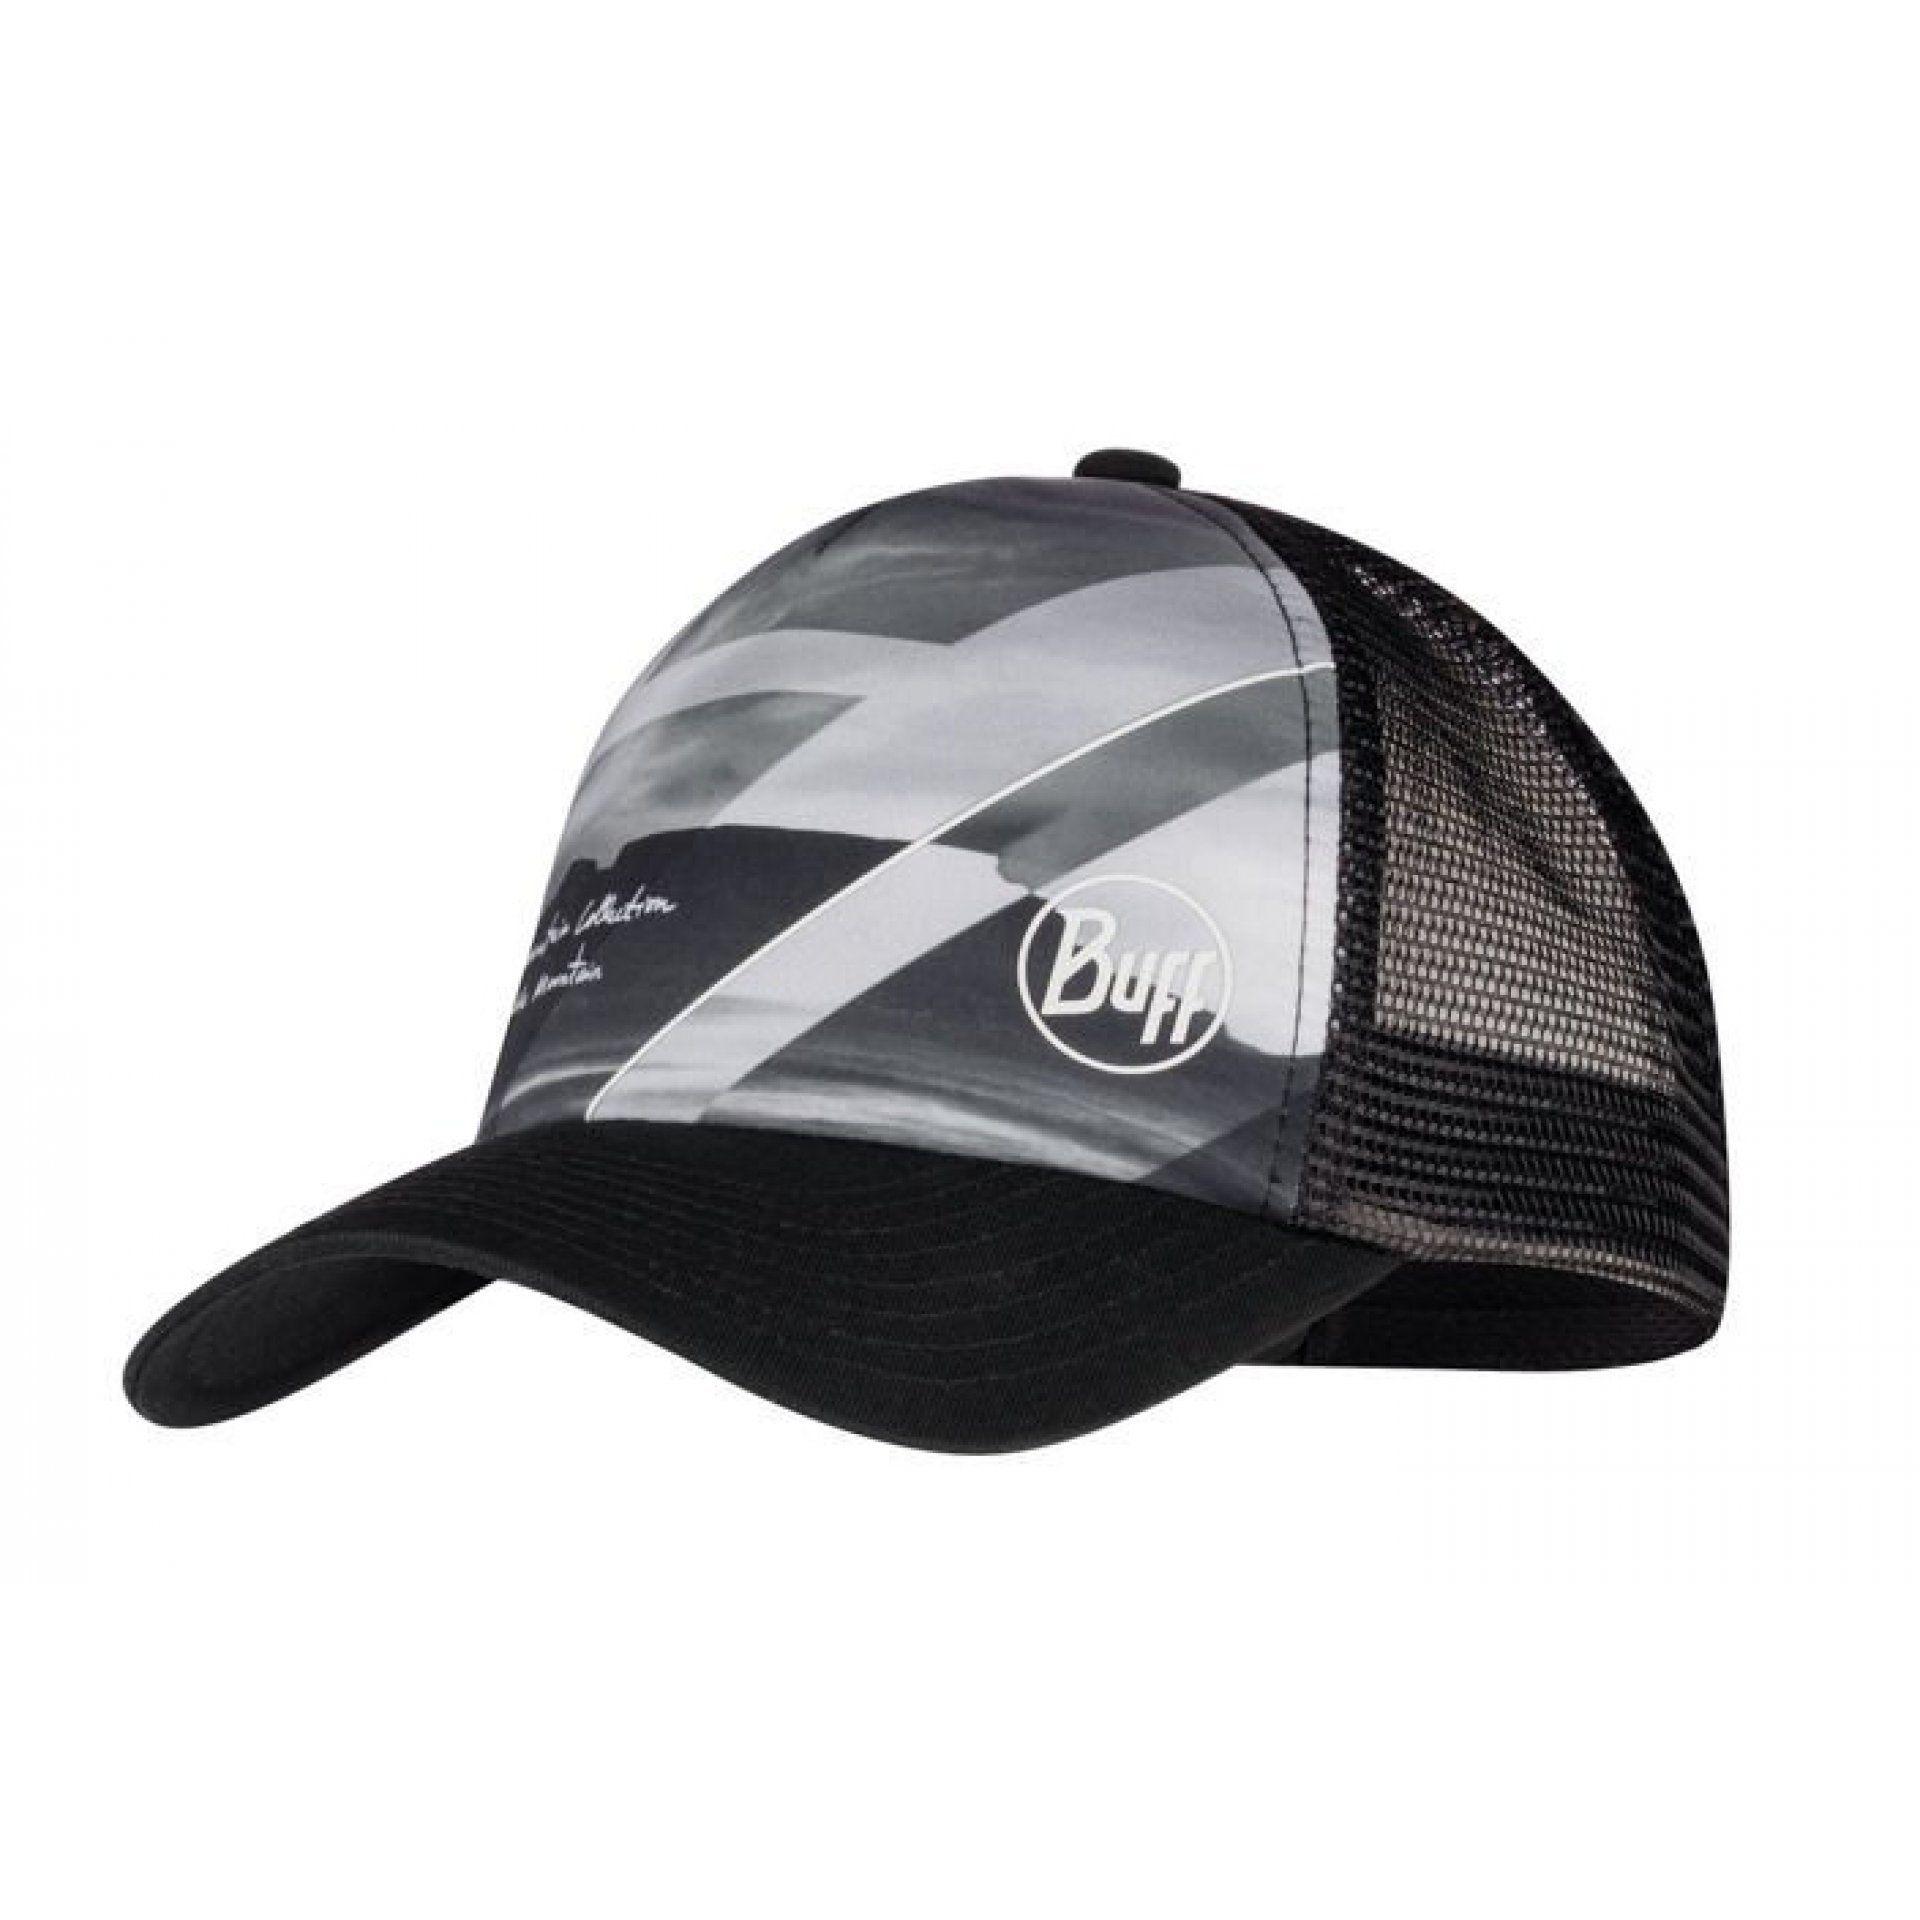 CZAPKA Z DASZKIEM BUFF TRUCKER CAP TABLE MOUNTAIN BLACK